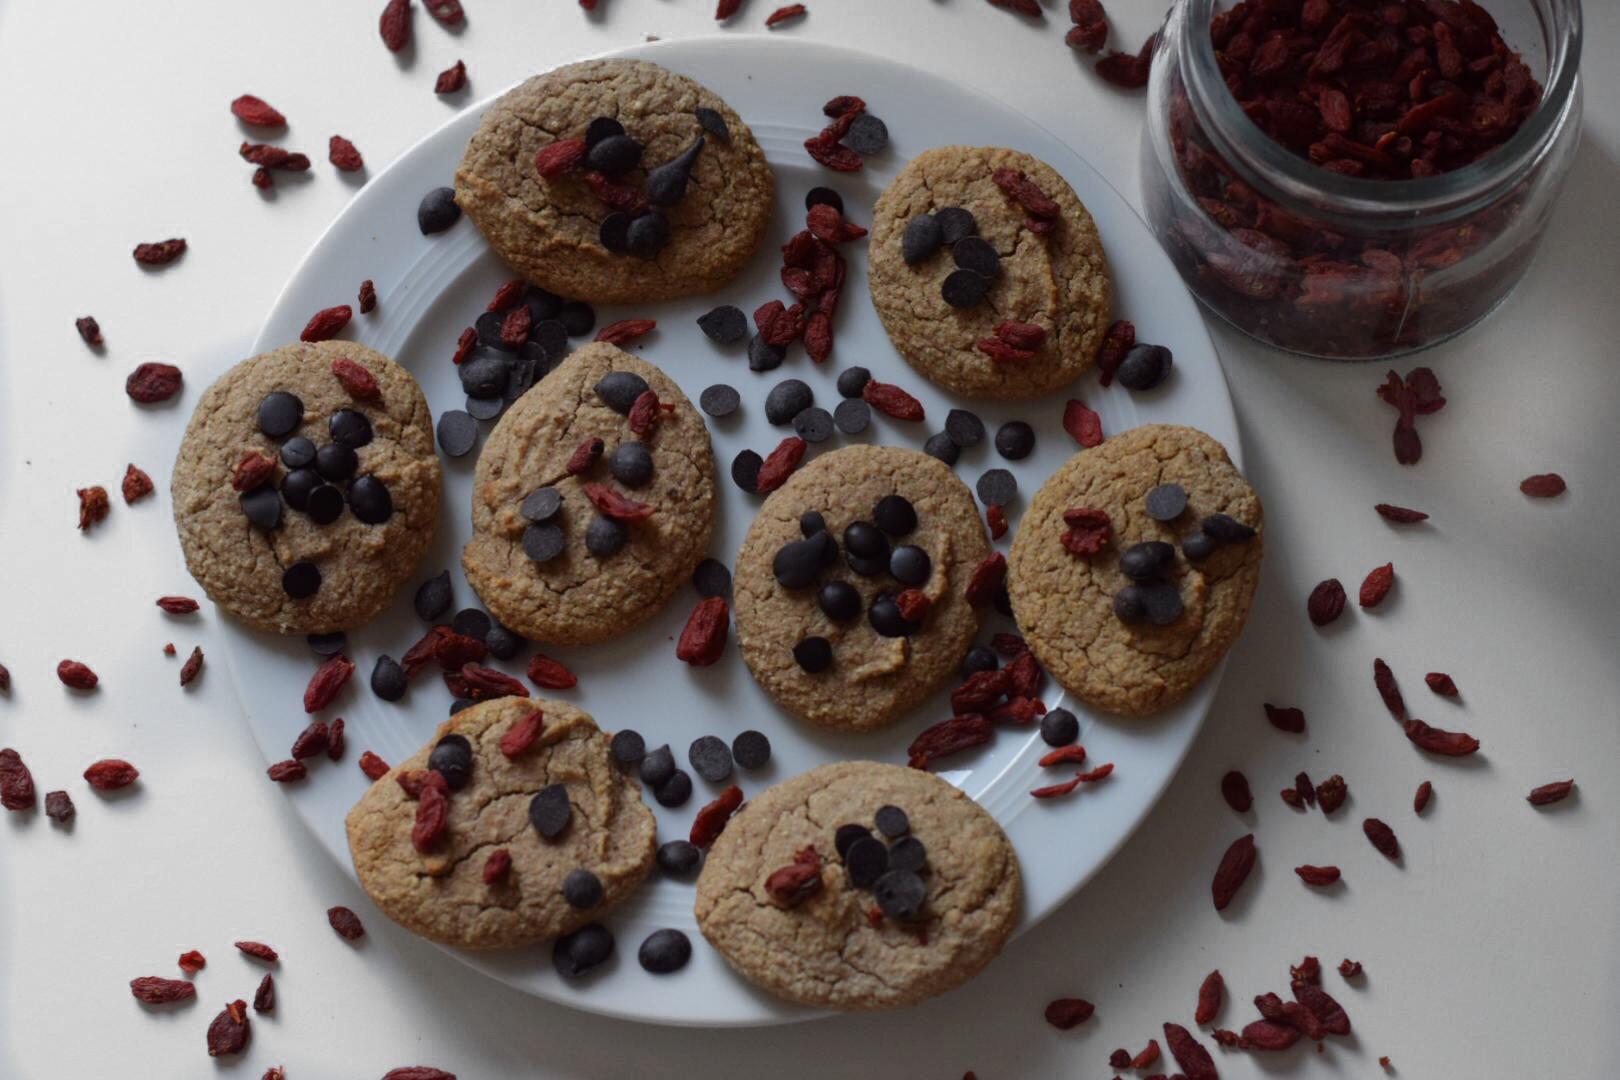 kokos-cookies-mit-wenig-kohlenhydraten